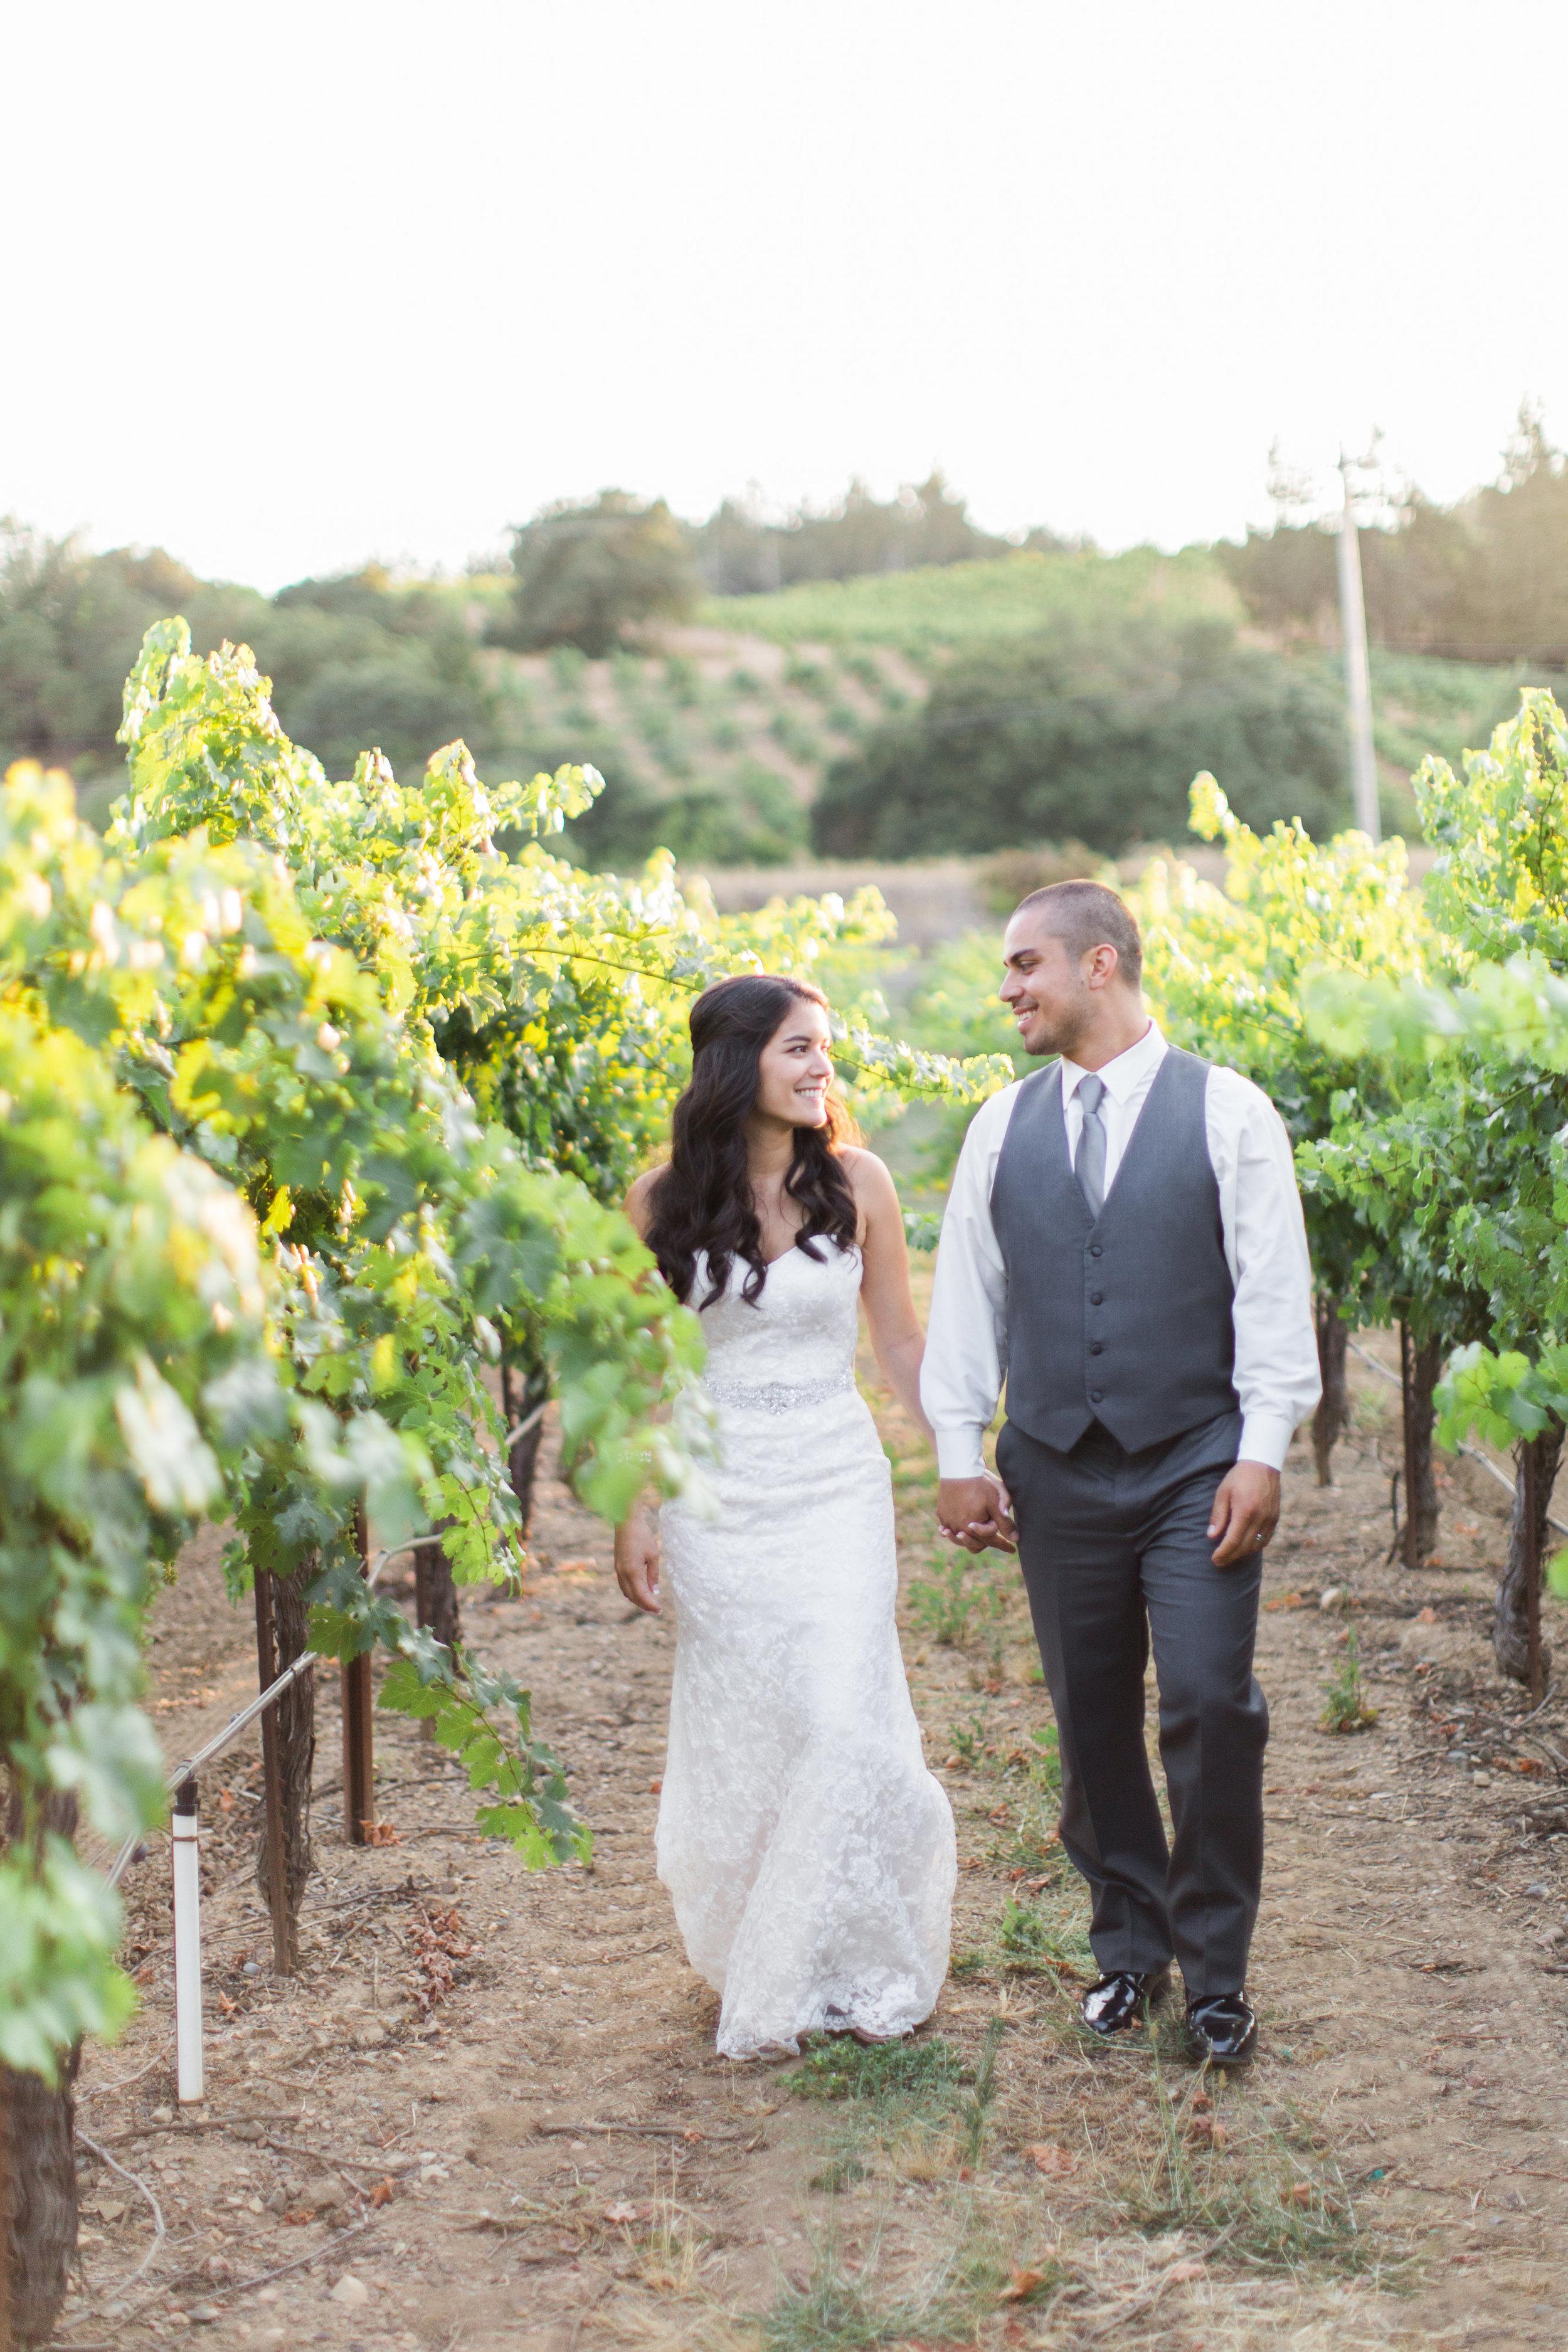 Ramos Wedding July 25 2015-Rodrigo and Brianna-0088.jpg